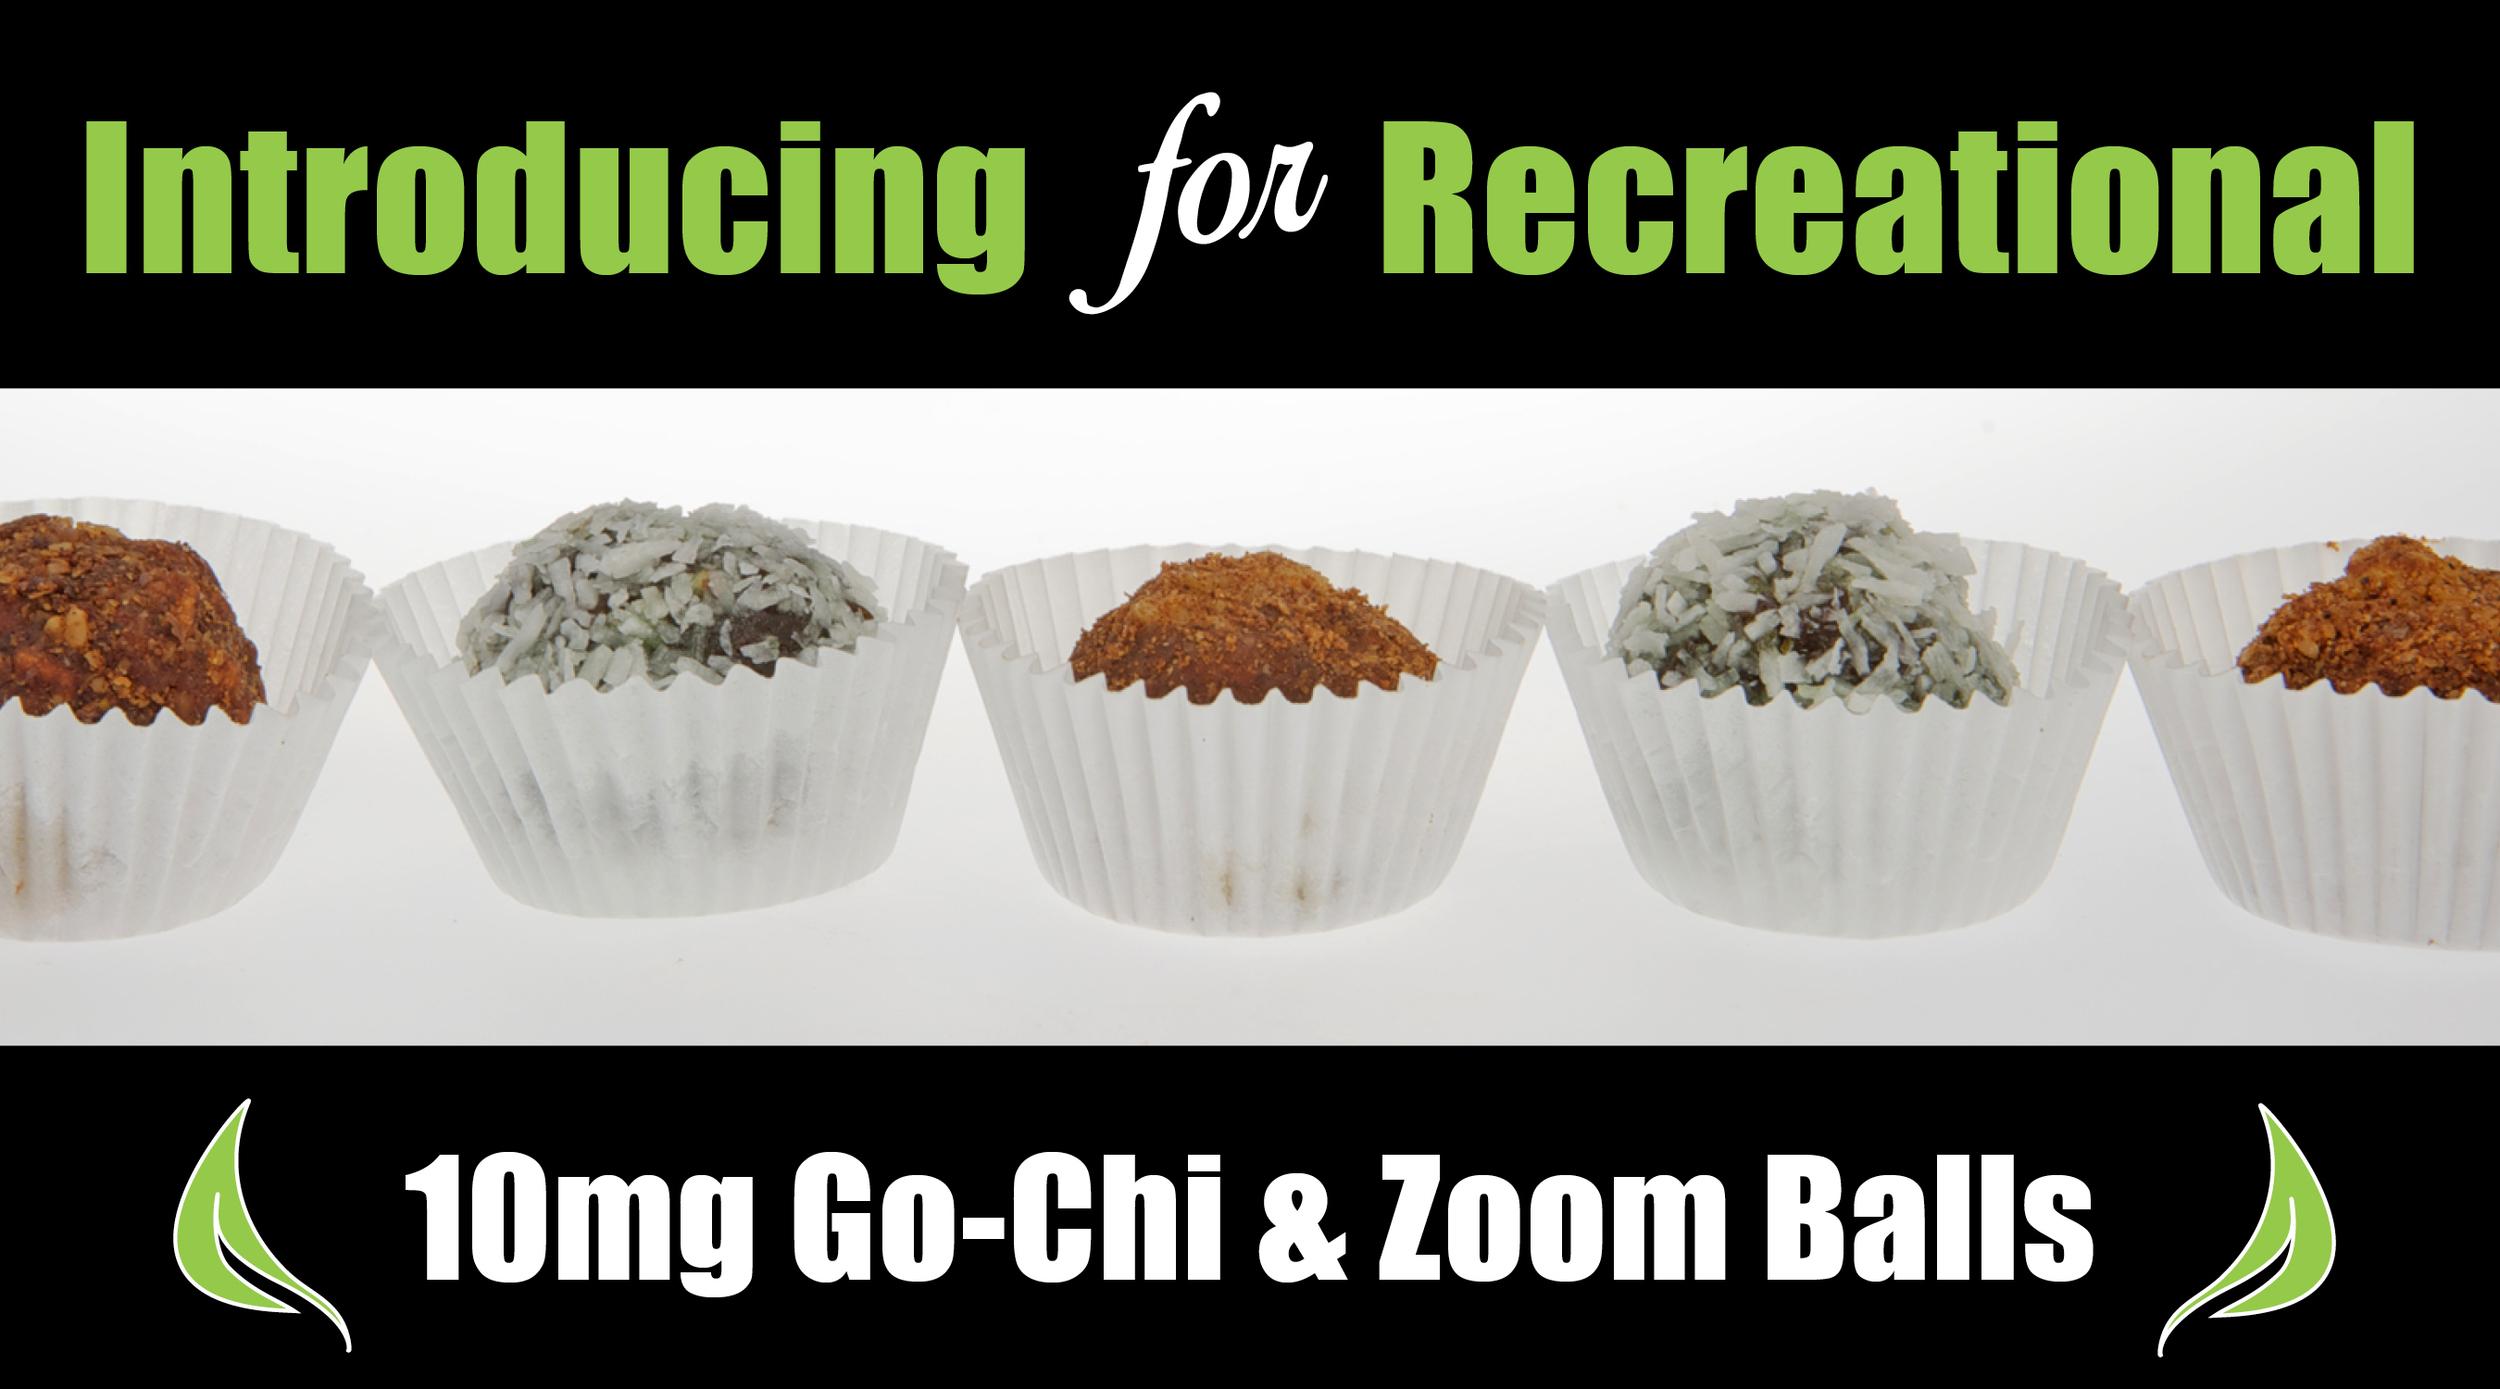 go-chi & zoom graphic (2).jpg